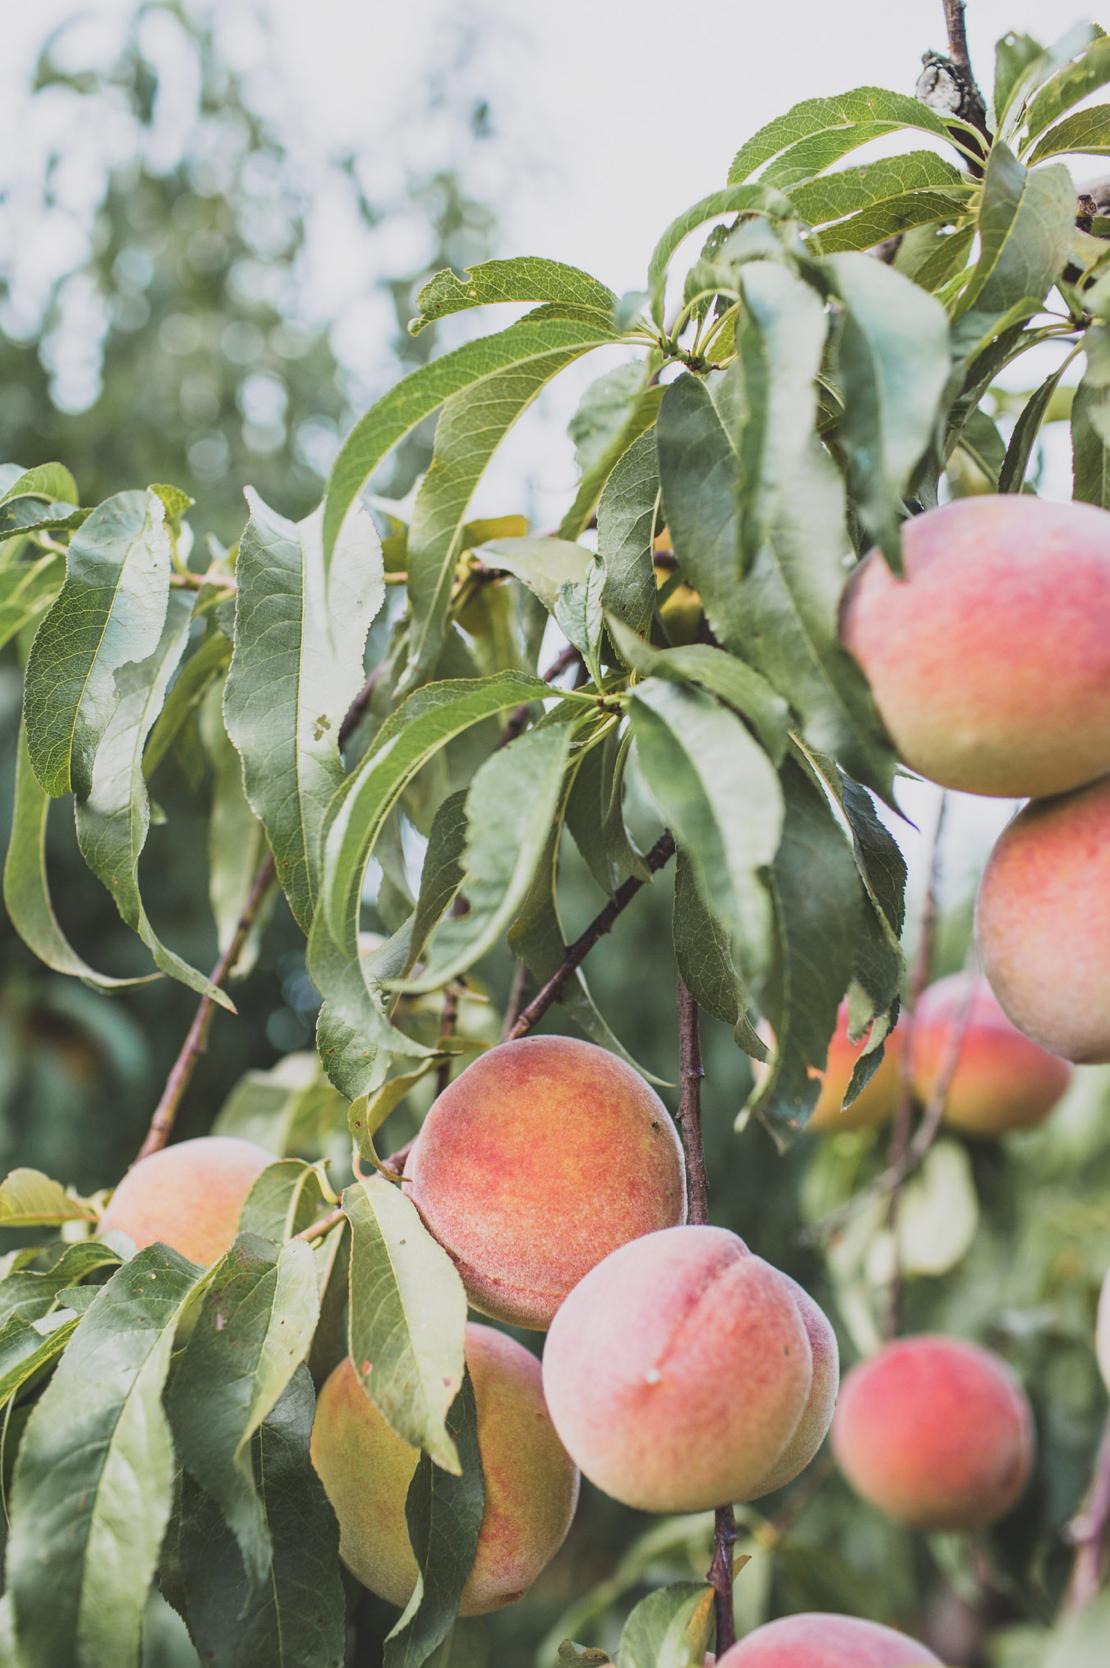 Detail photo of peach orchard on farmland.